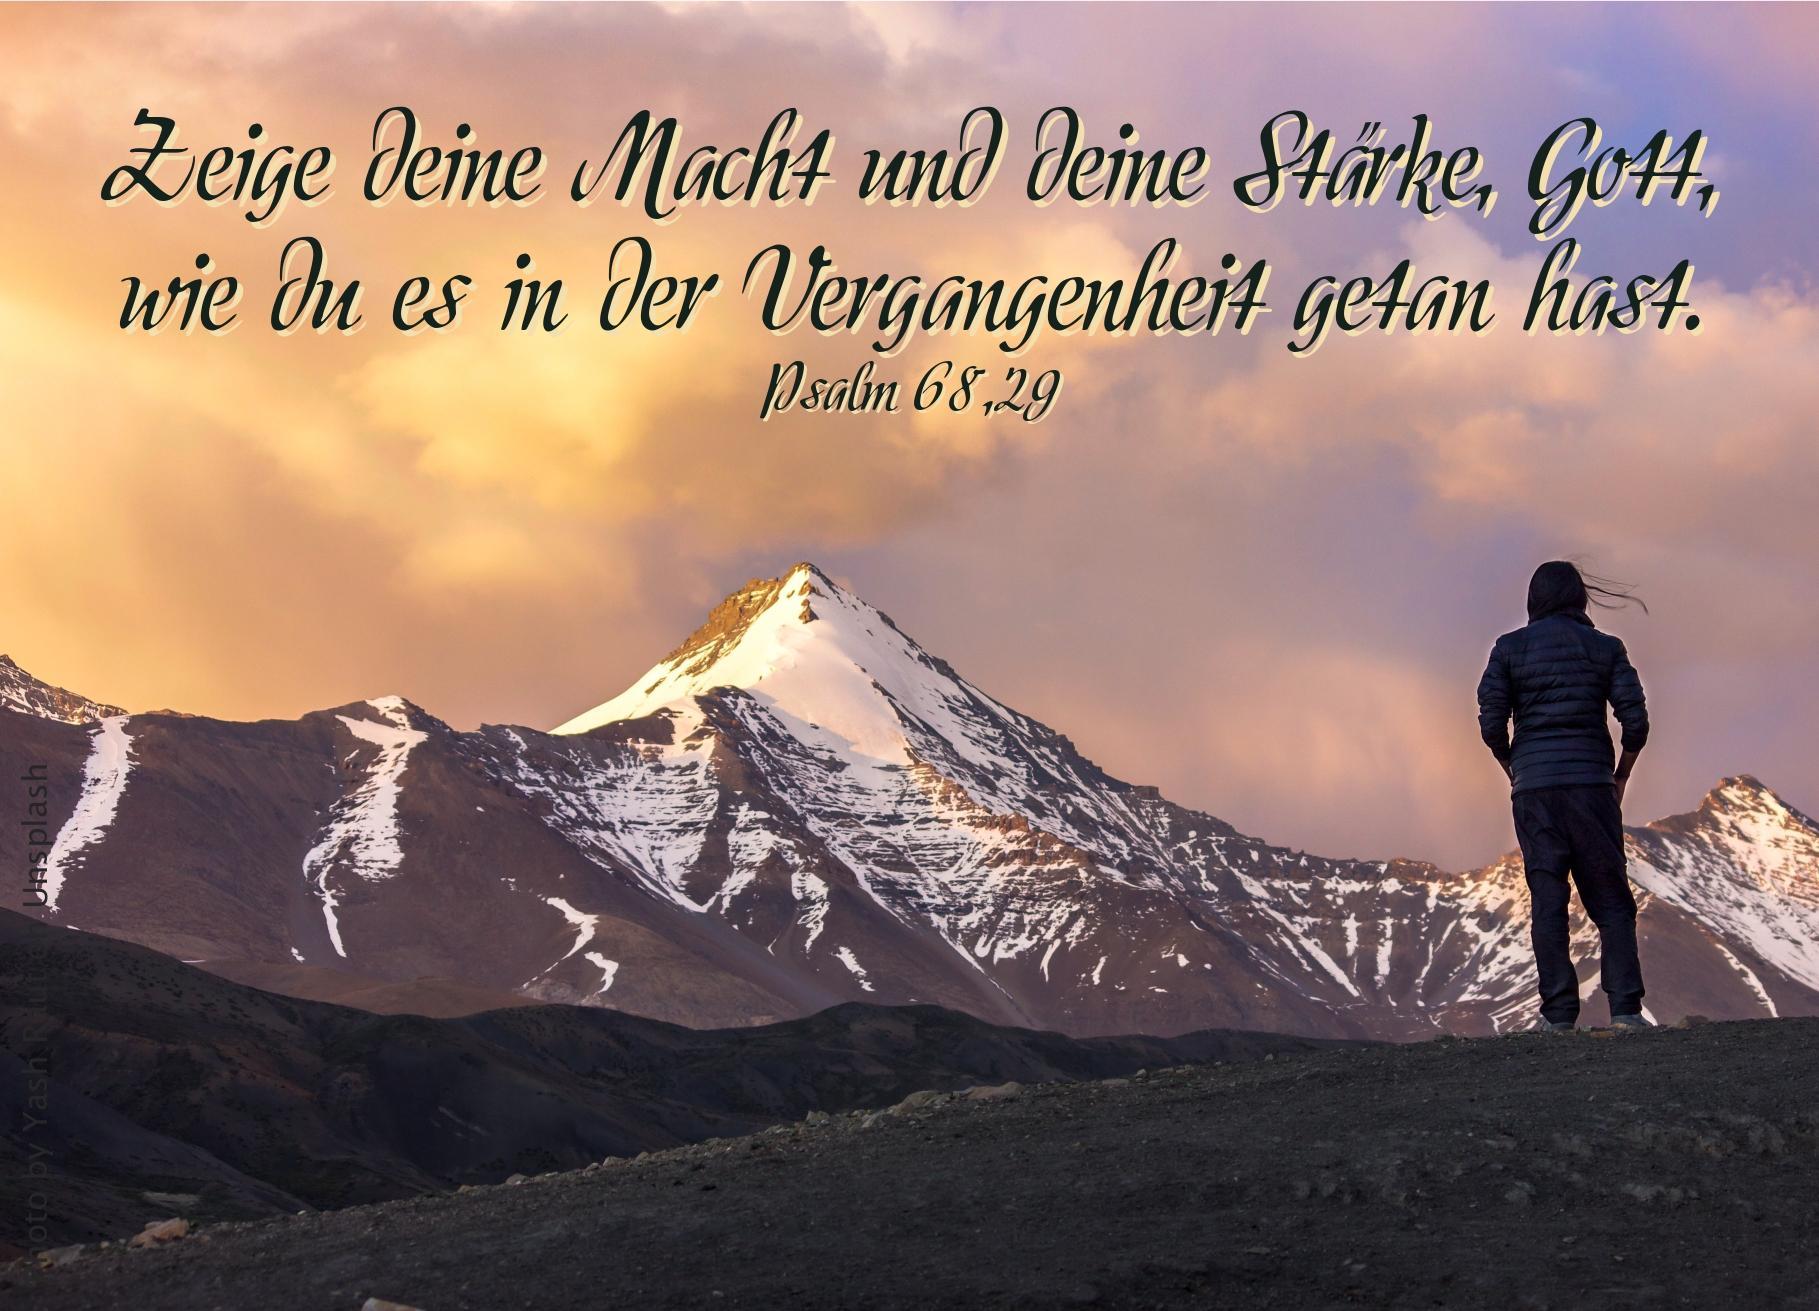 "alt=""Frau_vor_schneebedecktem_Bergmassiv_erwartet_bibelhoerbuch_Aussendung_der_Apostel"""